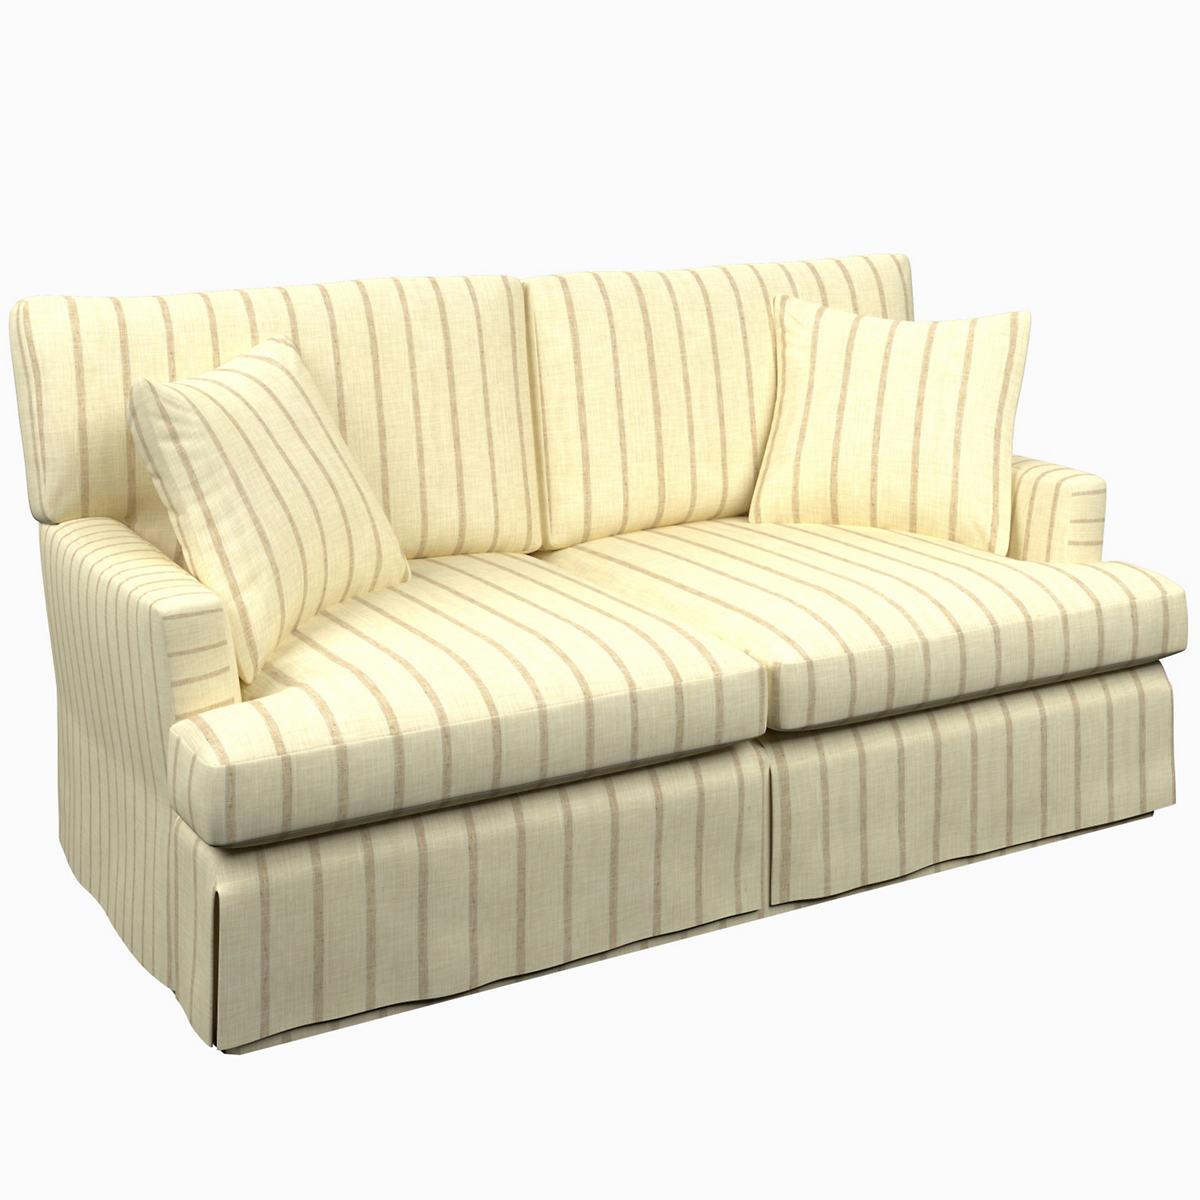 Glendale Stripe Natural/Grey Saybrook 2 Seater Slipcovered Sofa